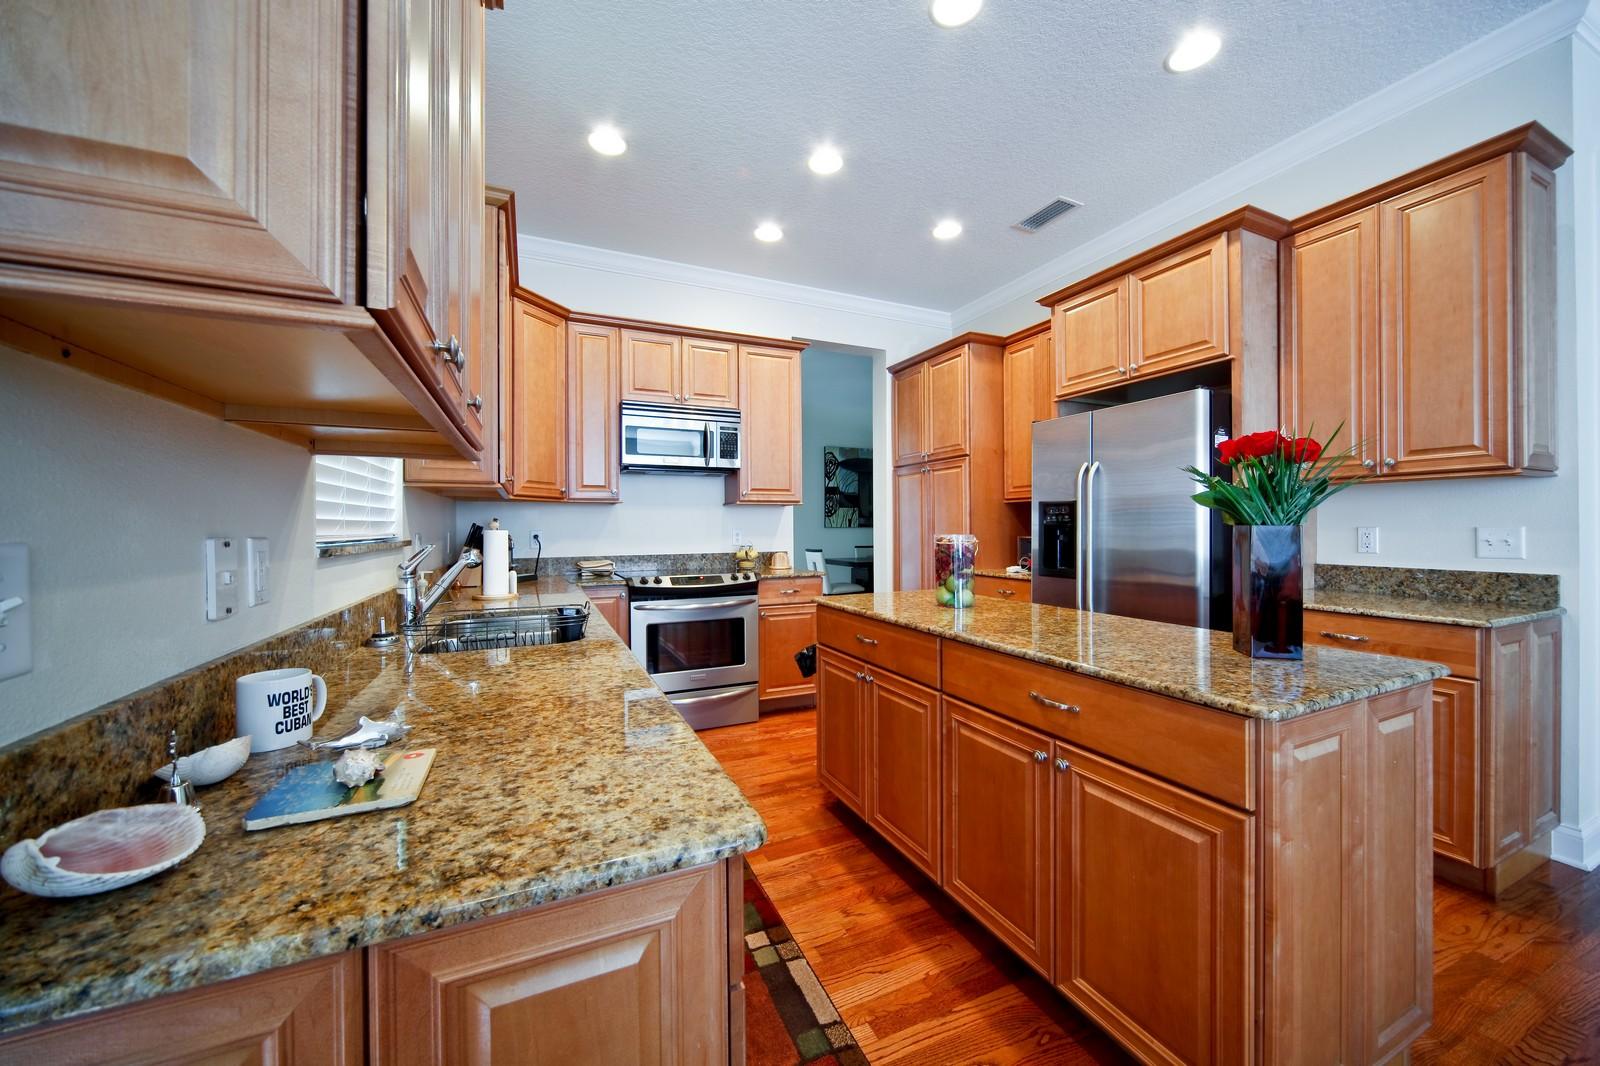 Real Estate Photography - 3812 El Prado Blvd, Tampa, FL, 33629 - Kitchen